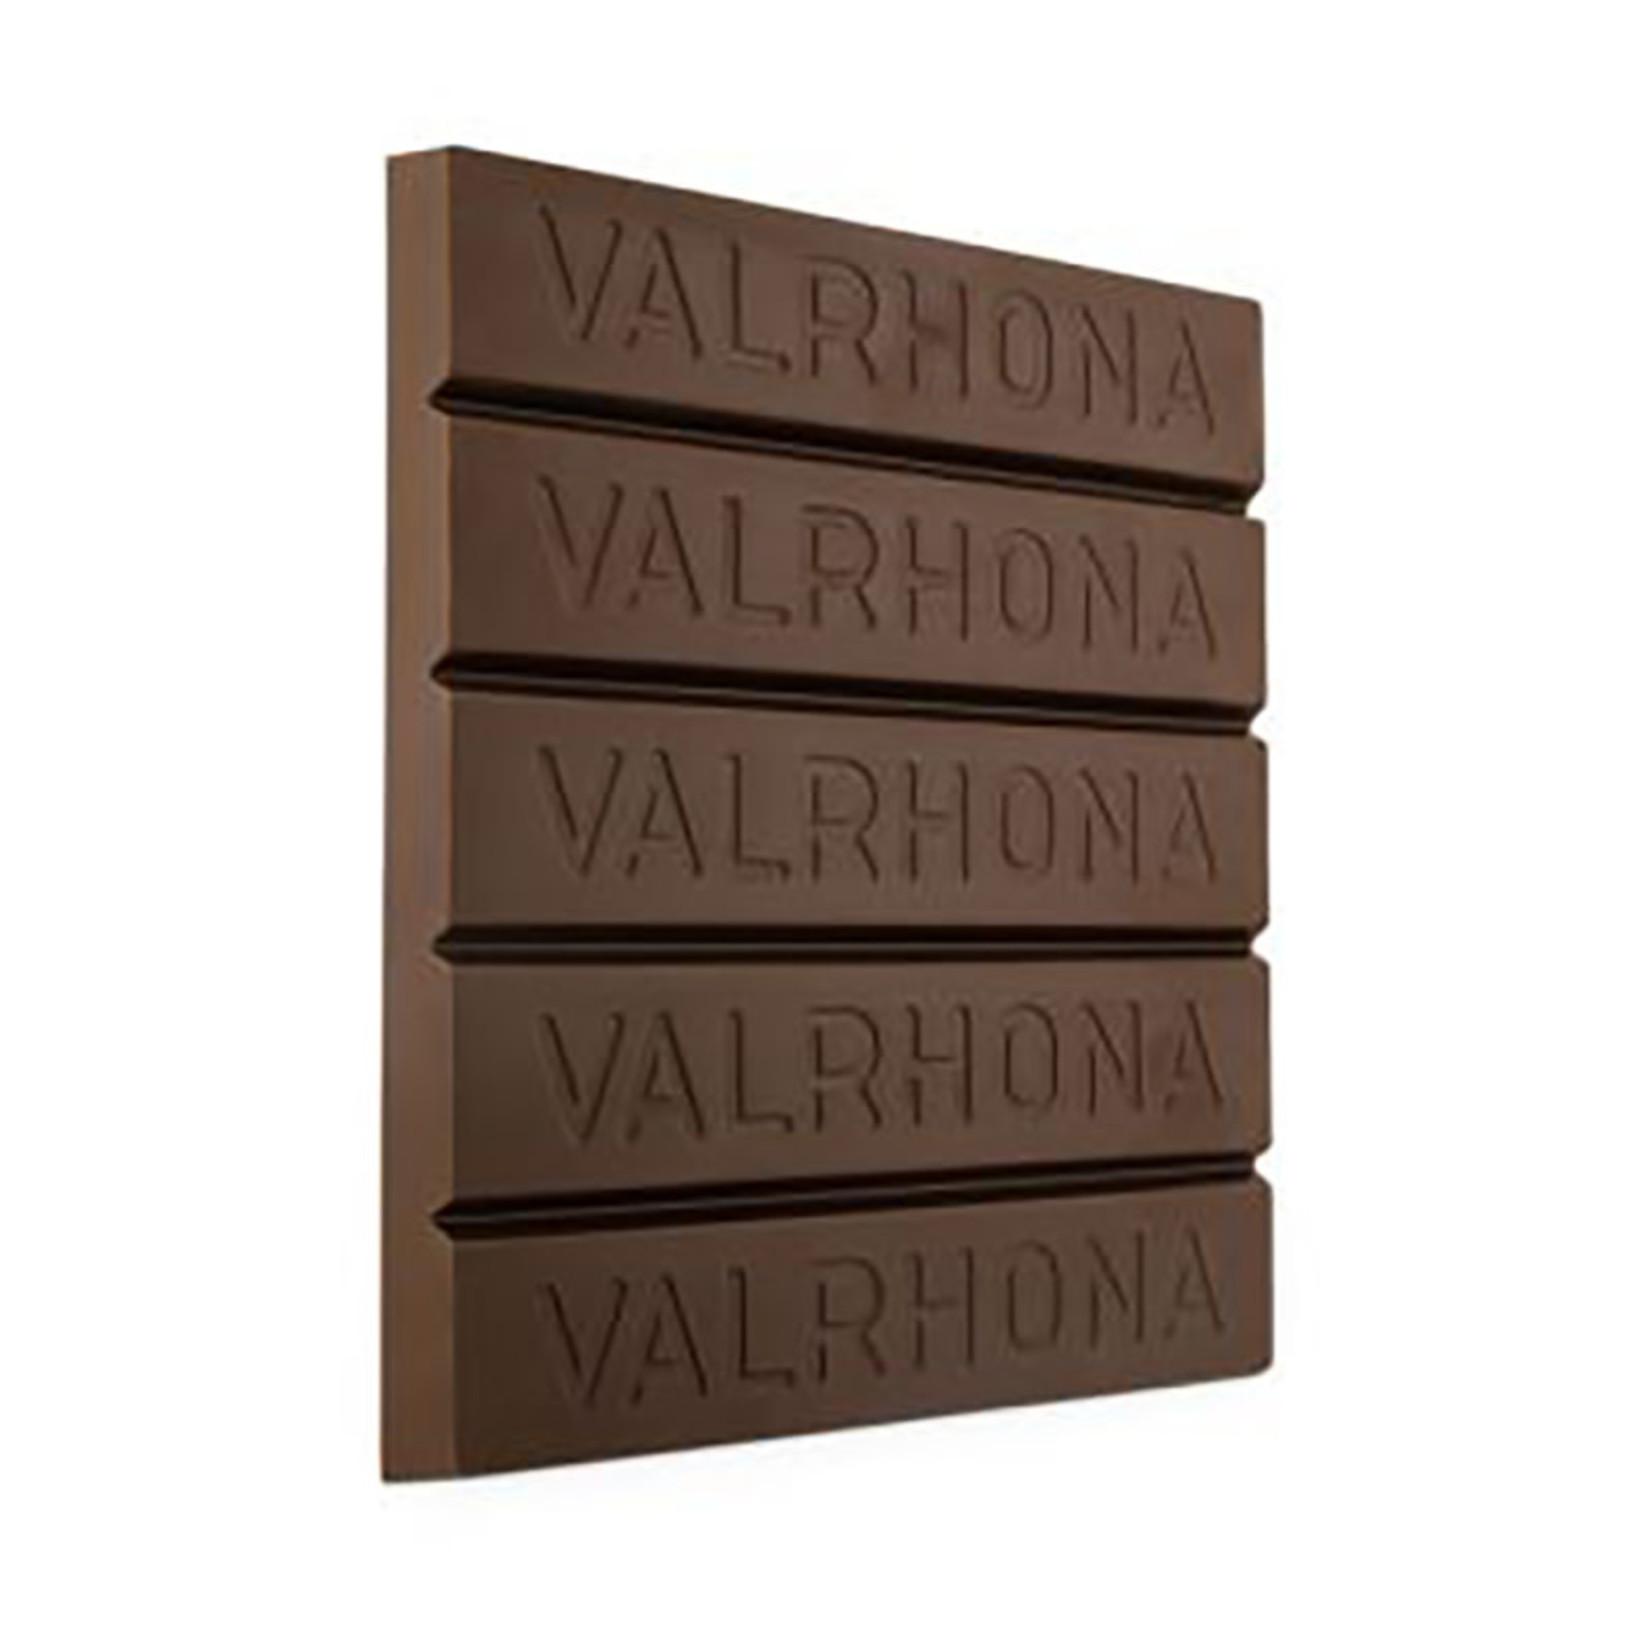 Valrhona Valrhona - Amatika Vegan Milk Chocolate 46% - 2.2lb/1kg, 28074-R